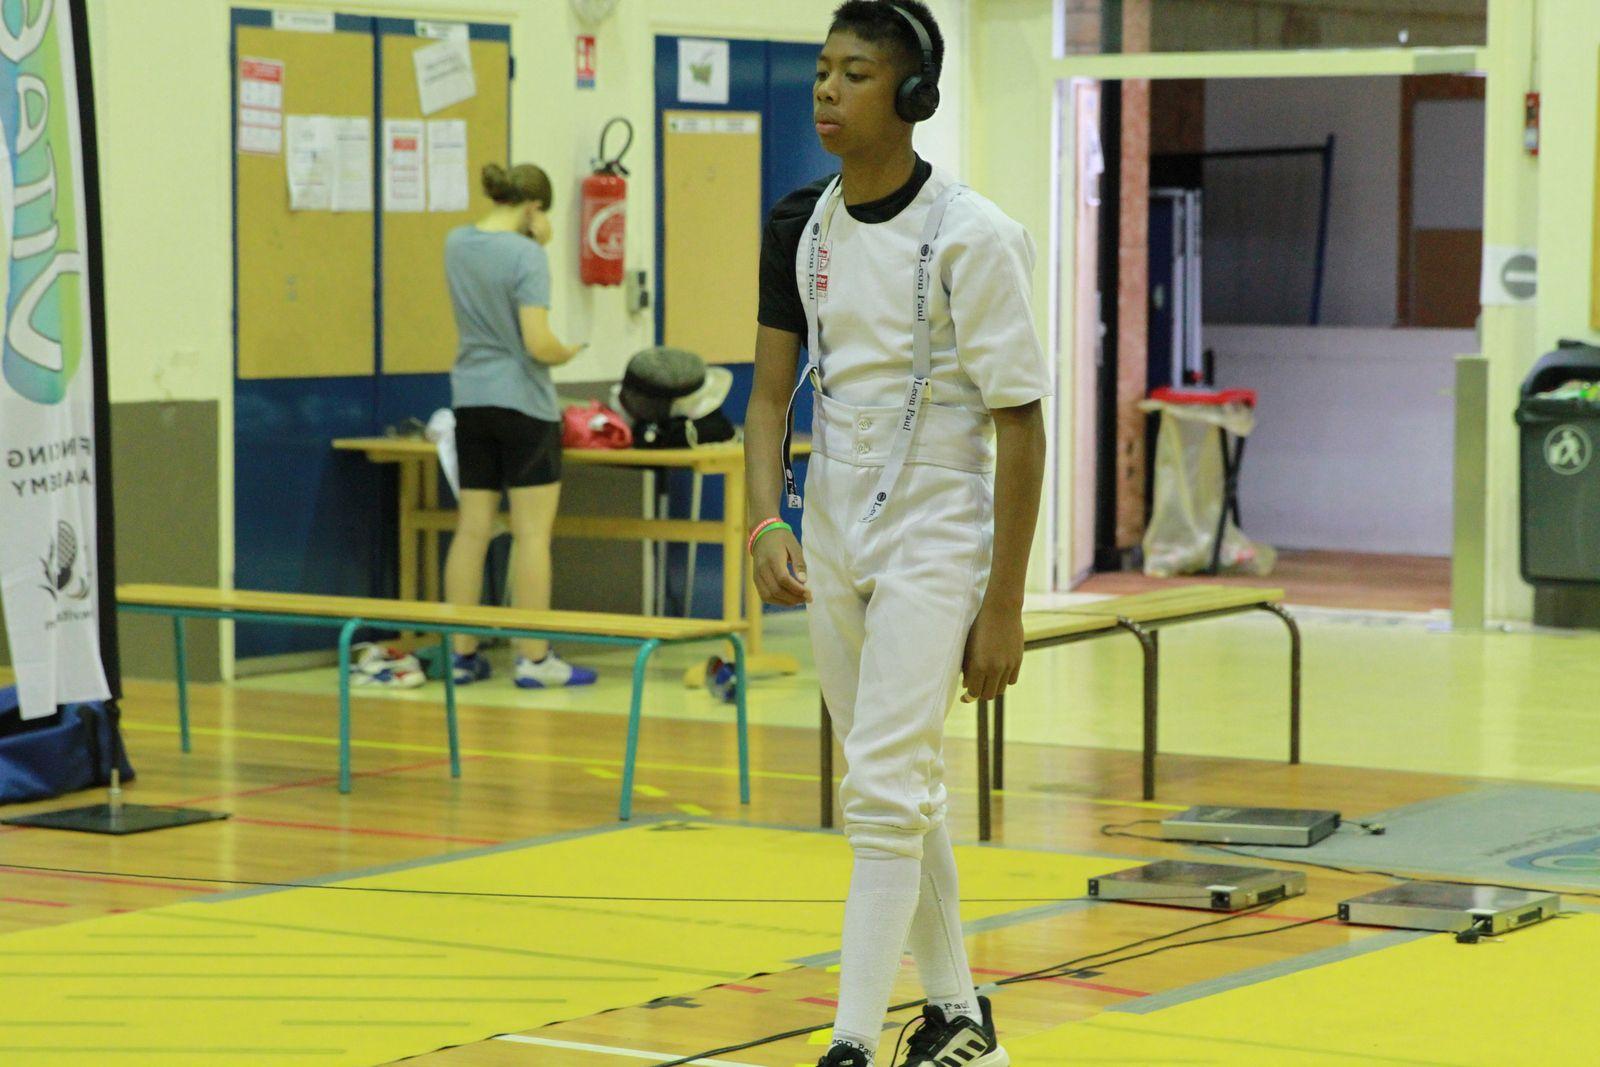 TC Epée U17-U20 2021 - Album Jour 6 - Vendredi 30 juillet